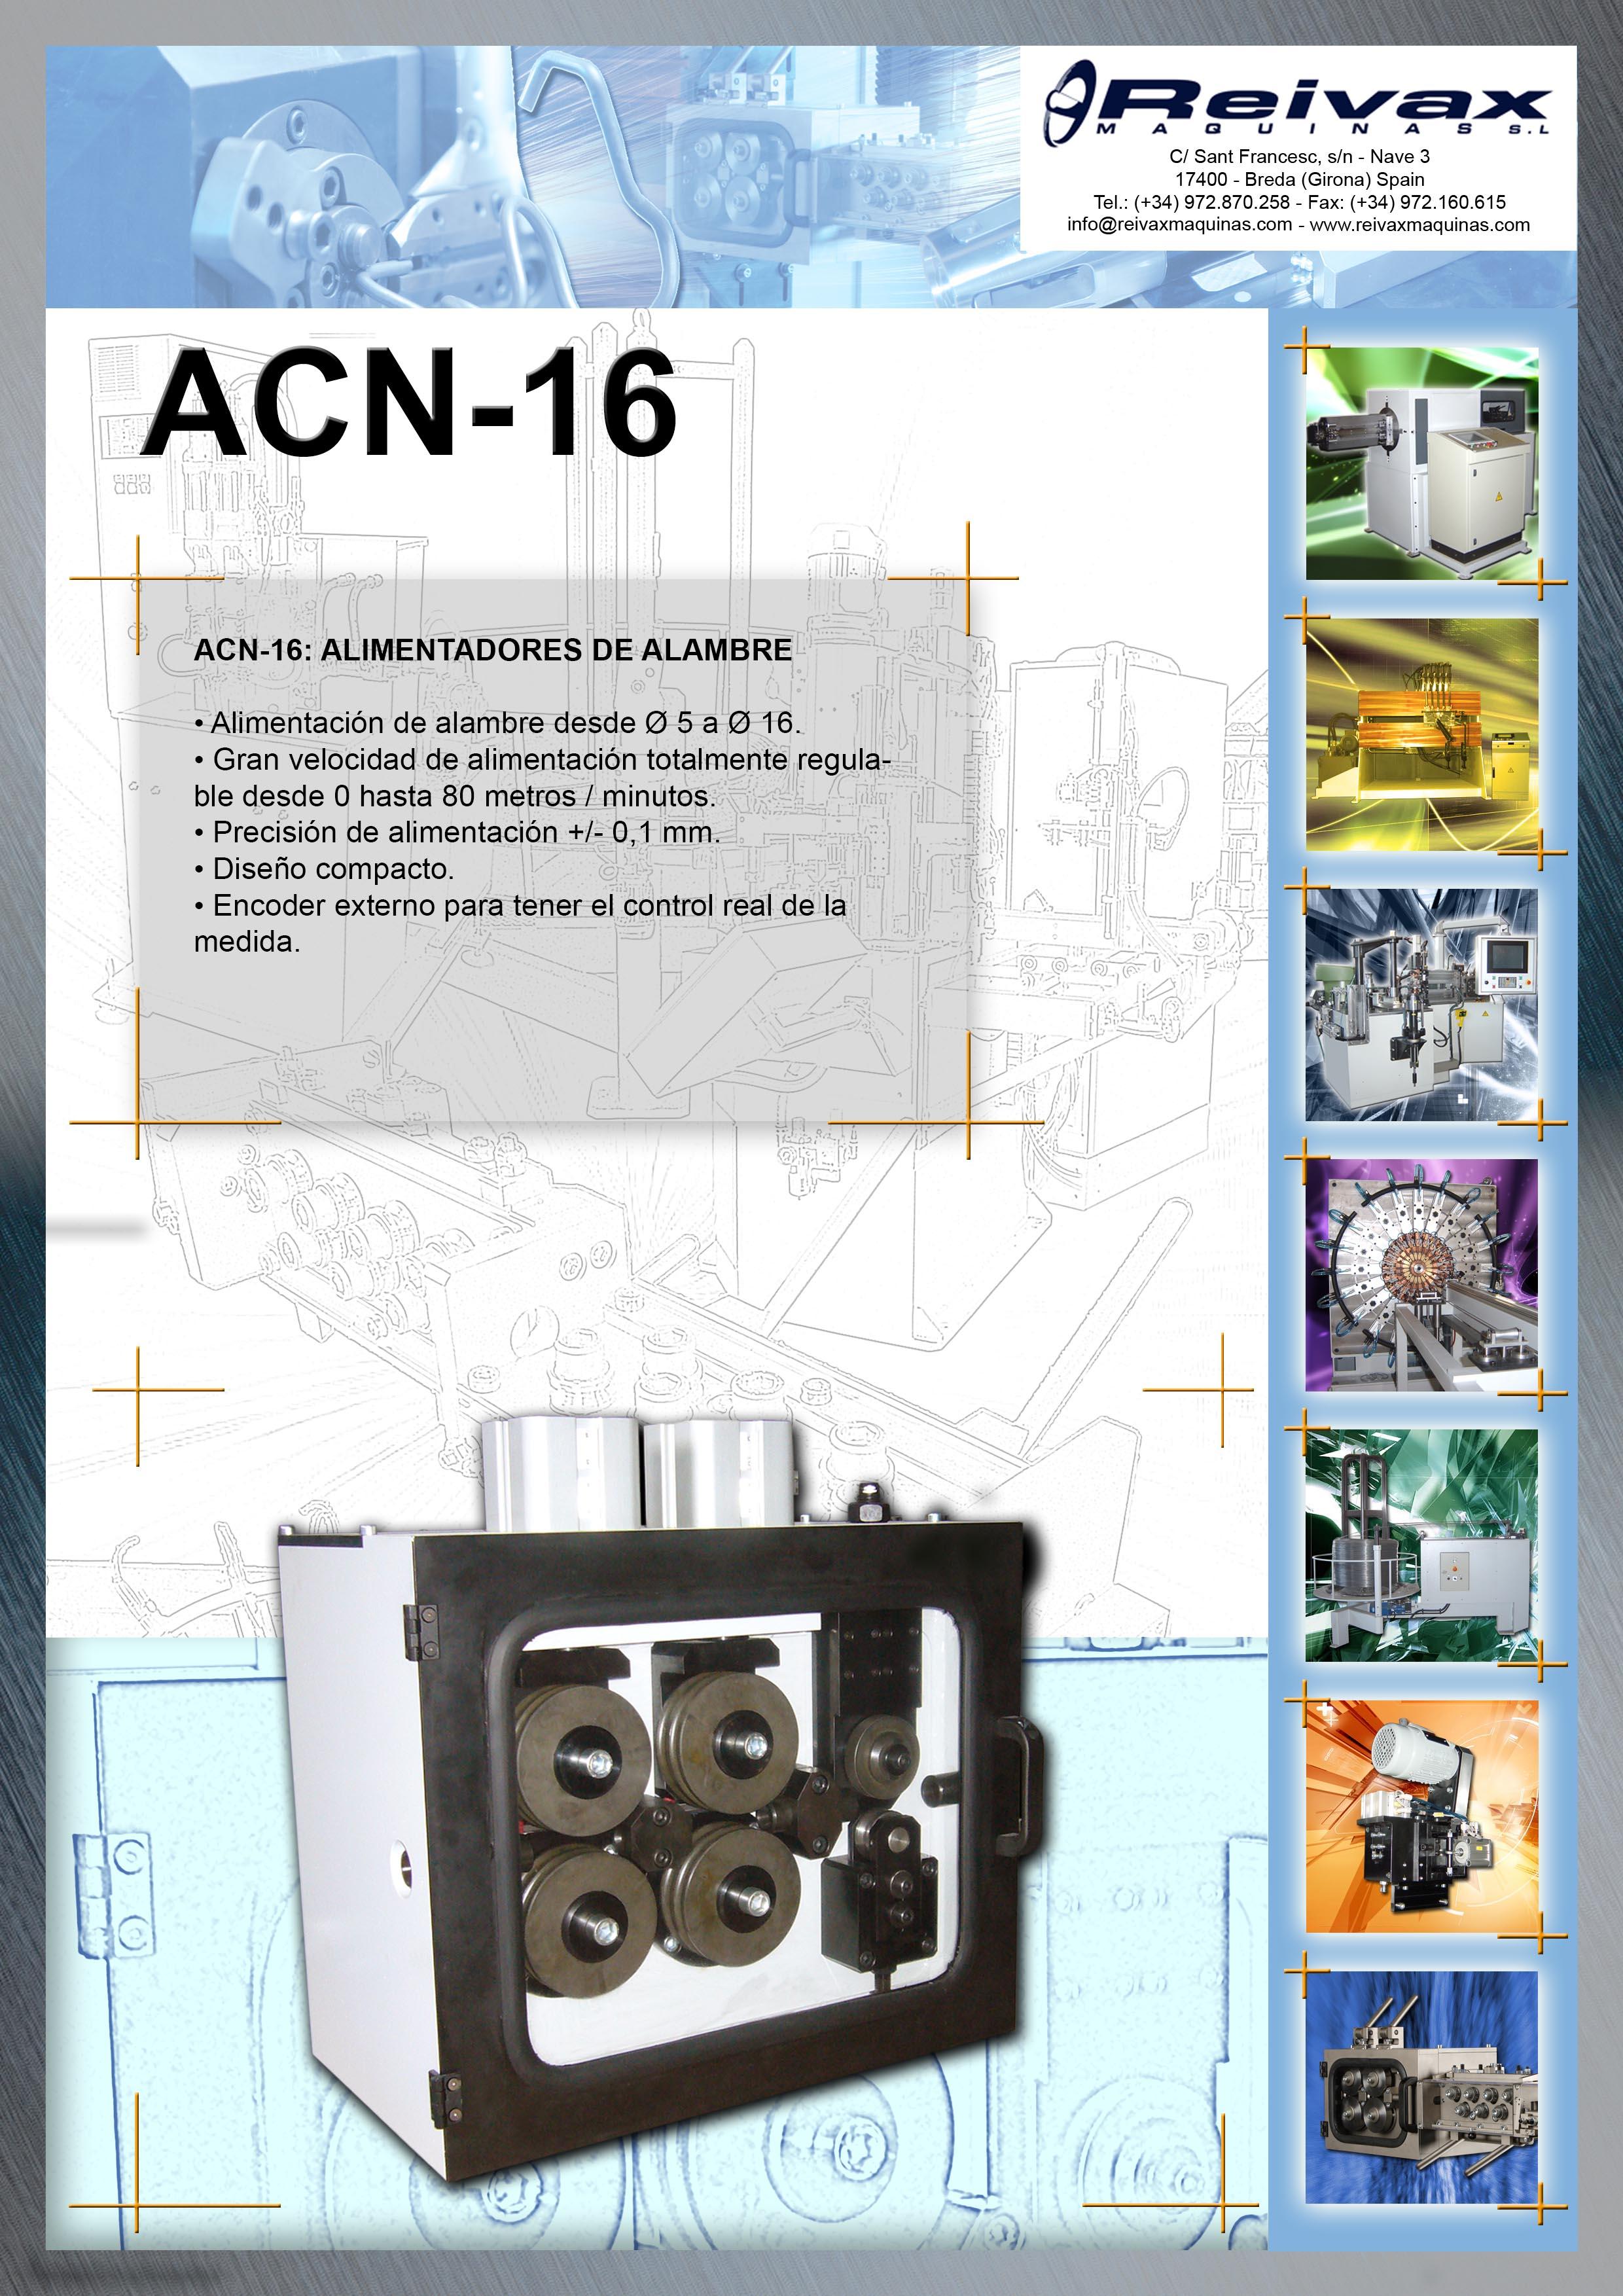 ReivaxMaquinas: Ficha Tecnica ACN-16